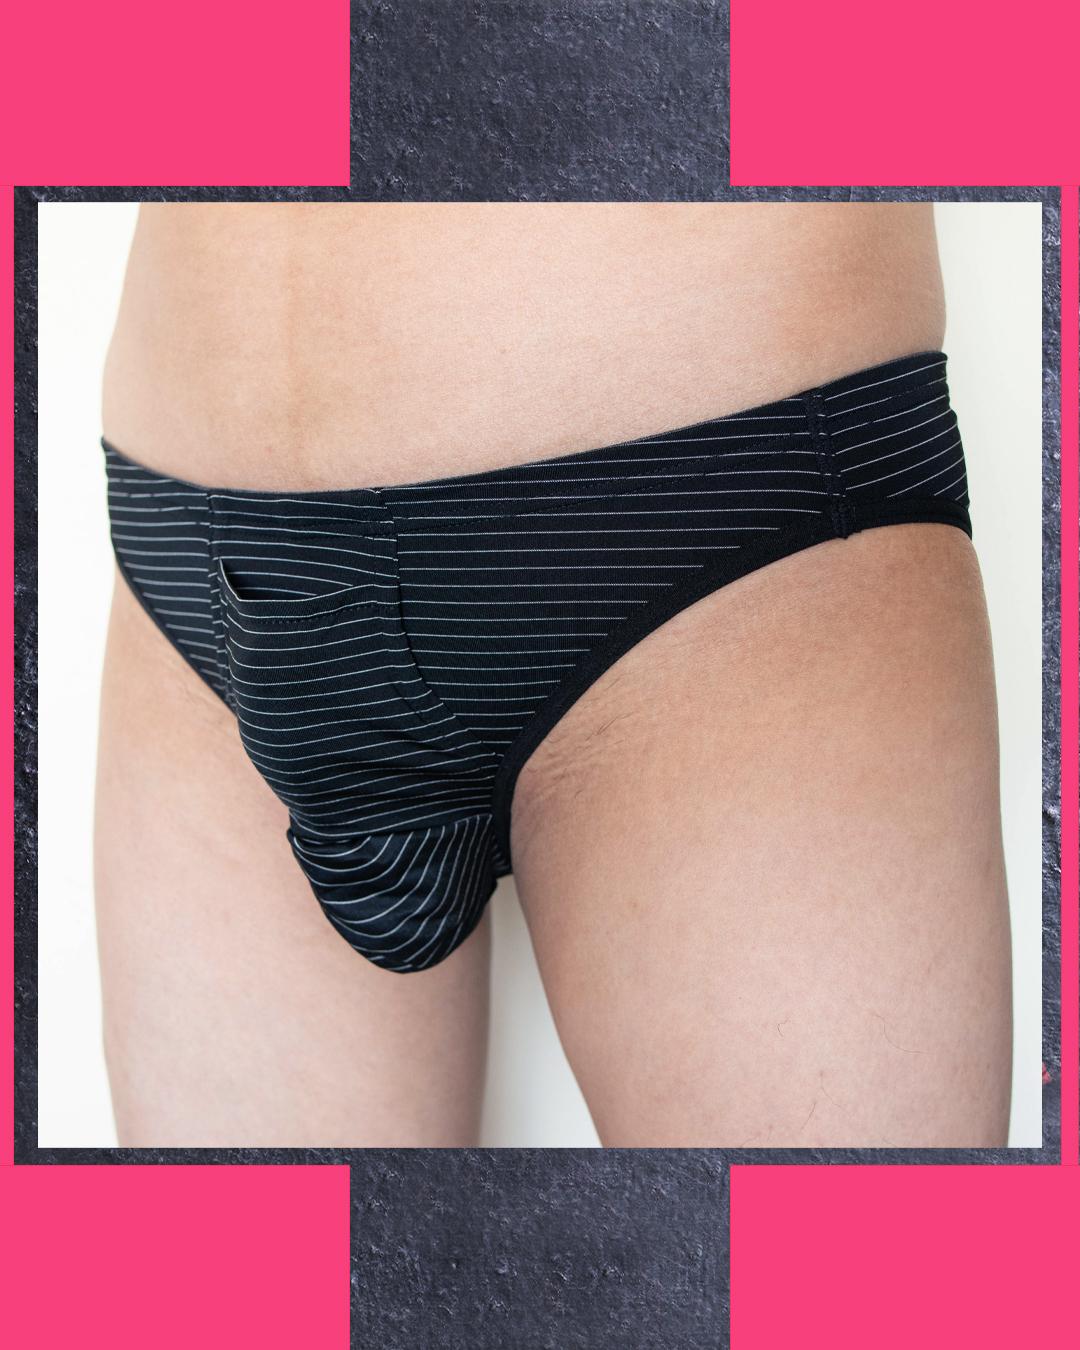 King Style Underwear, Man's Wear, Sexy Underwear,  男性囊袋內褲, 三角褲, 內褲, 男男內褲